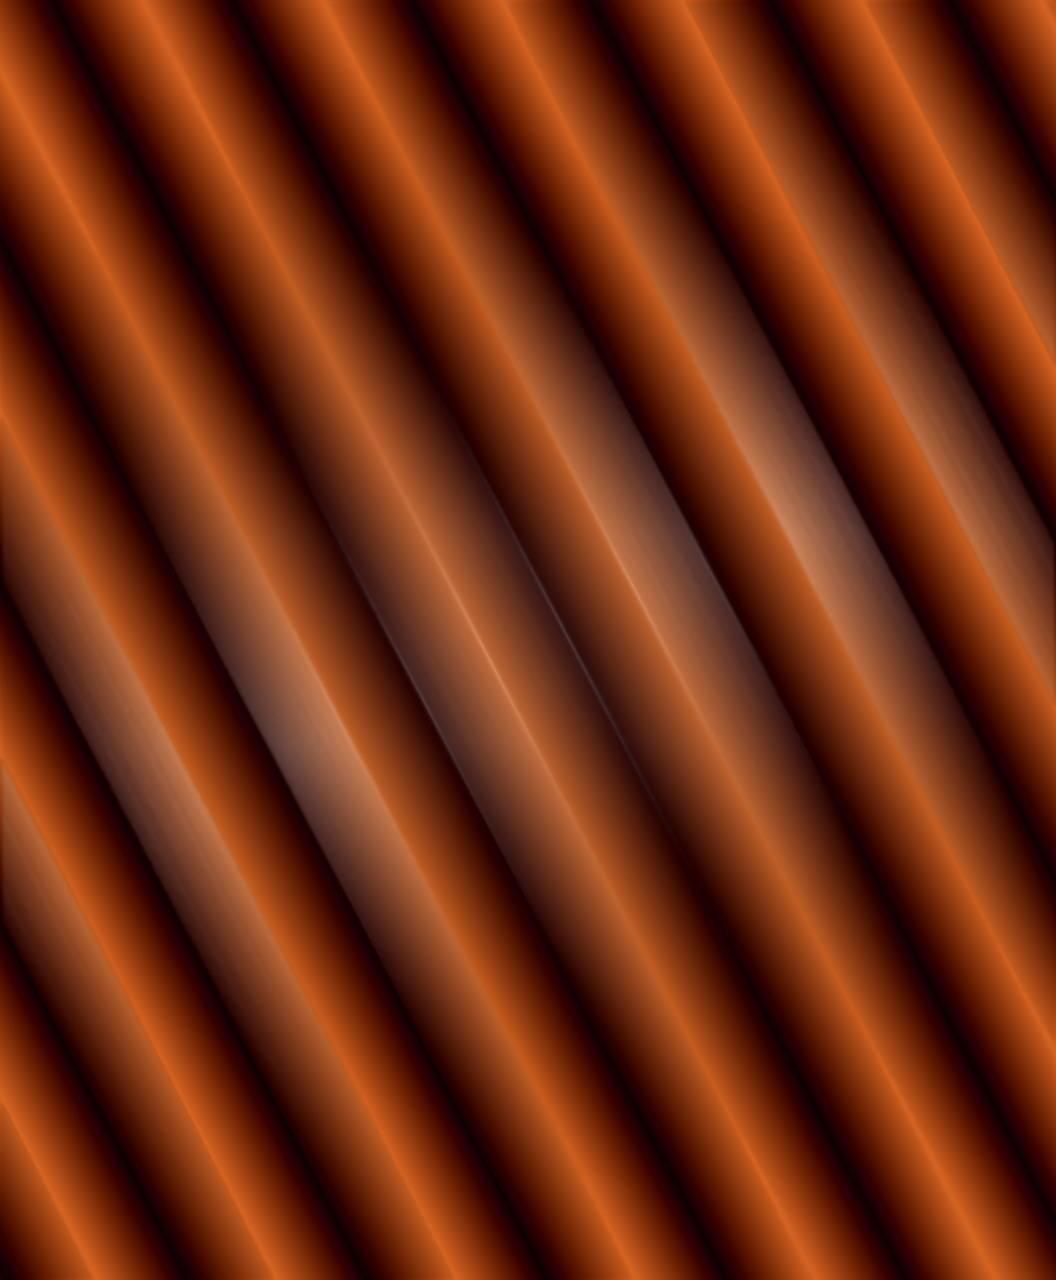 3D IPhoneX Orange Wallpaper By Druffix2 2d Free On ZEDGE™